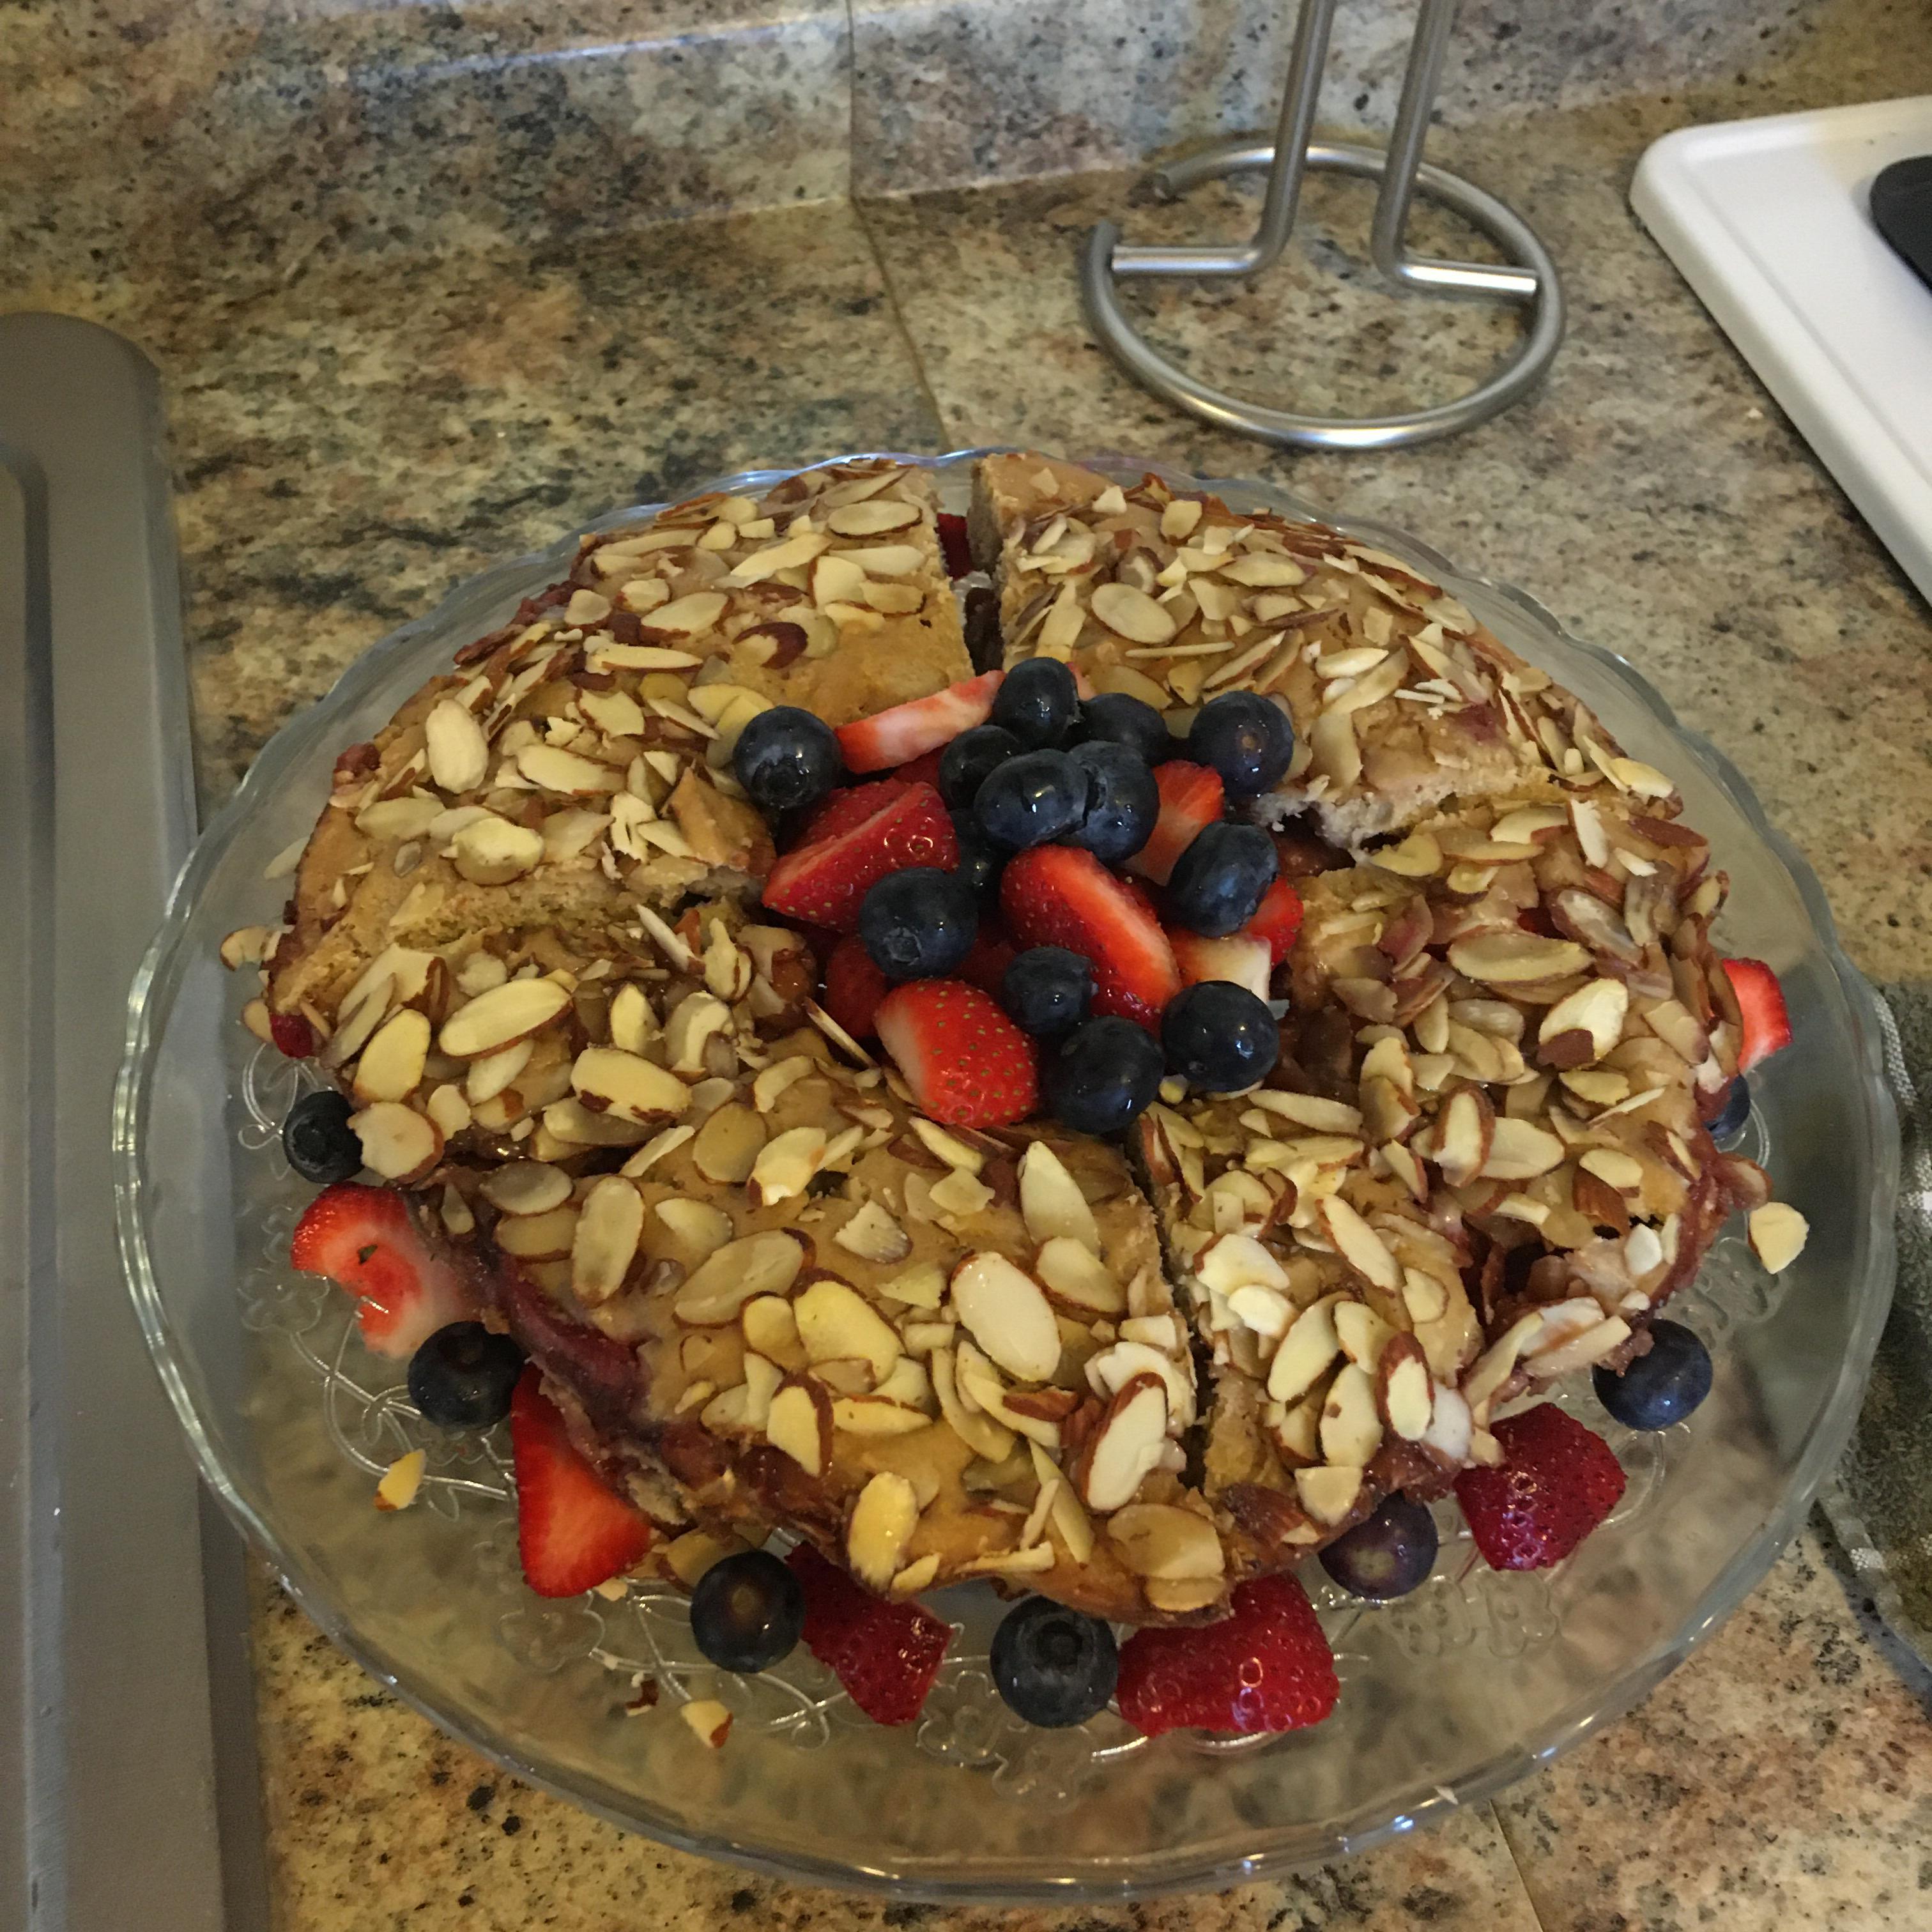 Delicious Strawberry Almond Coffee Cake - A Guilt Free Indulgence! Elizabeth Do Carmo